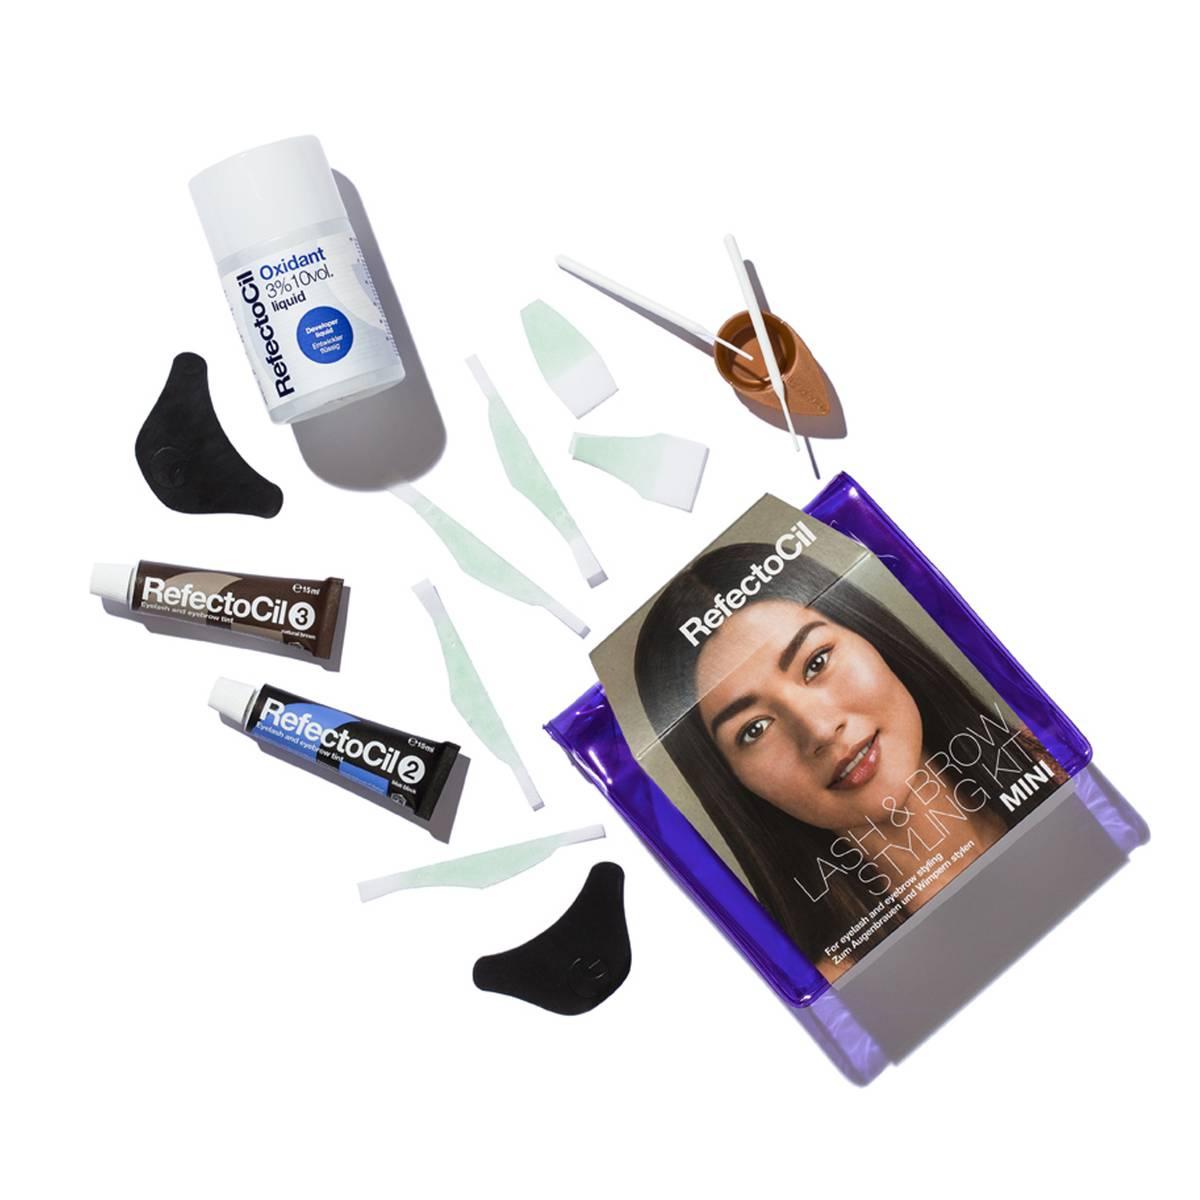 RefectoCil Mini Lash & Brow Styling Kit